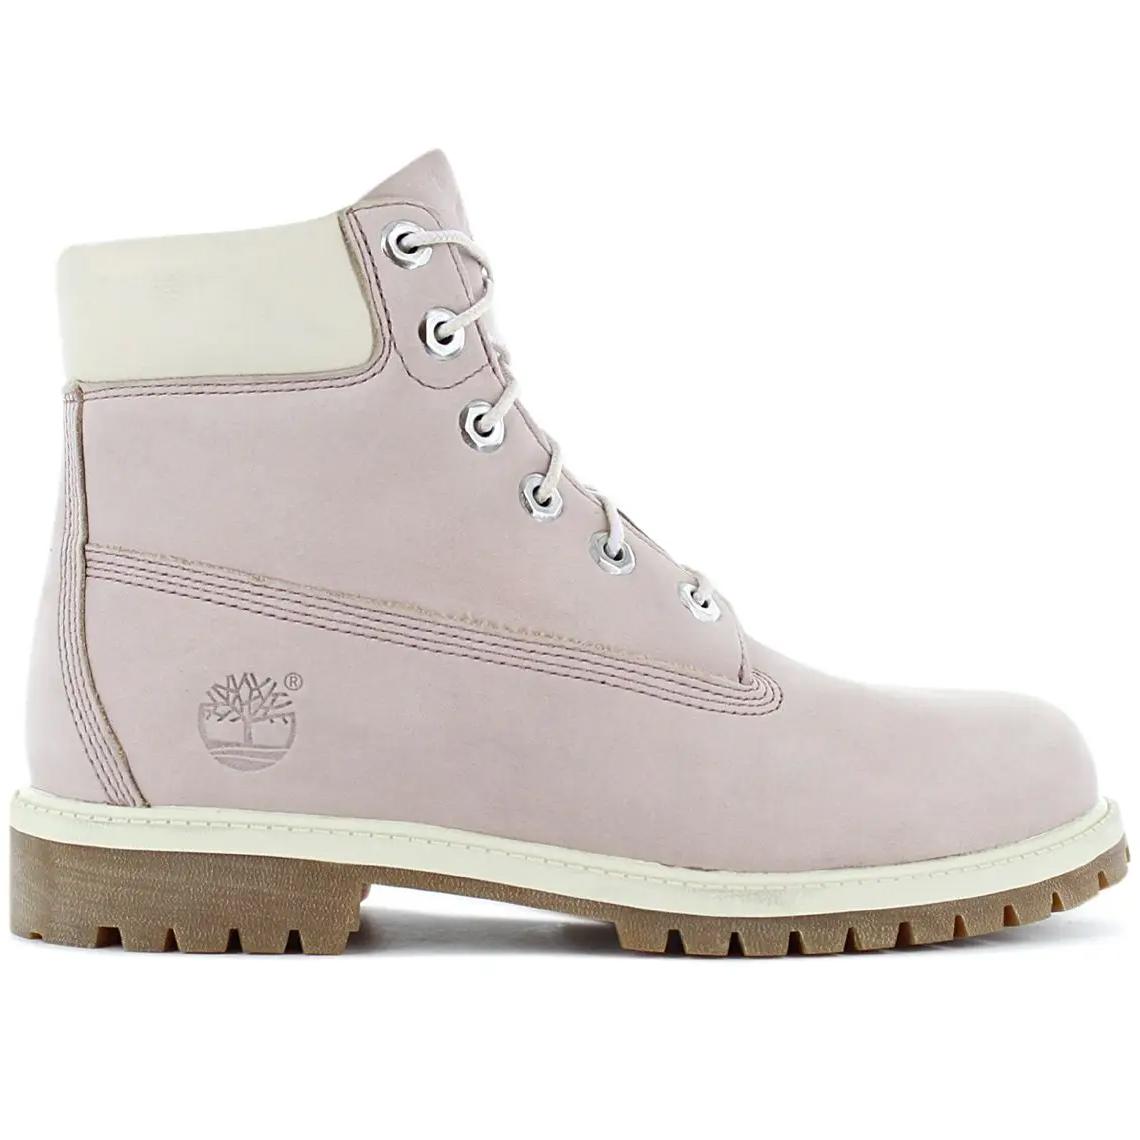 Timberland 6 Inch Premium Junior Boot medium purple 034992 524